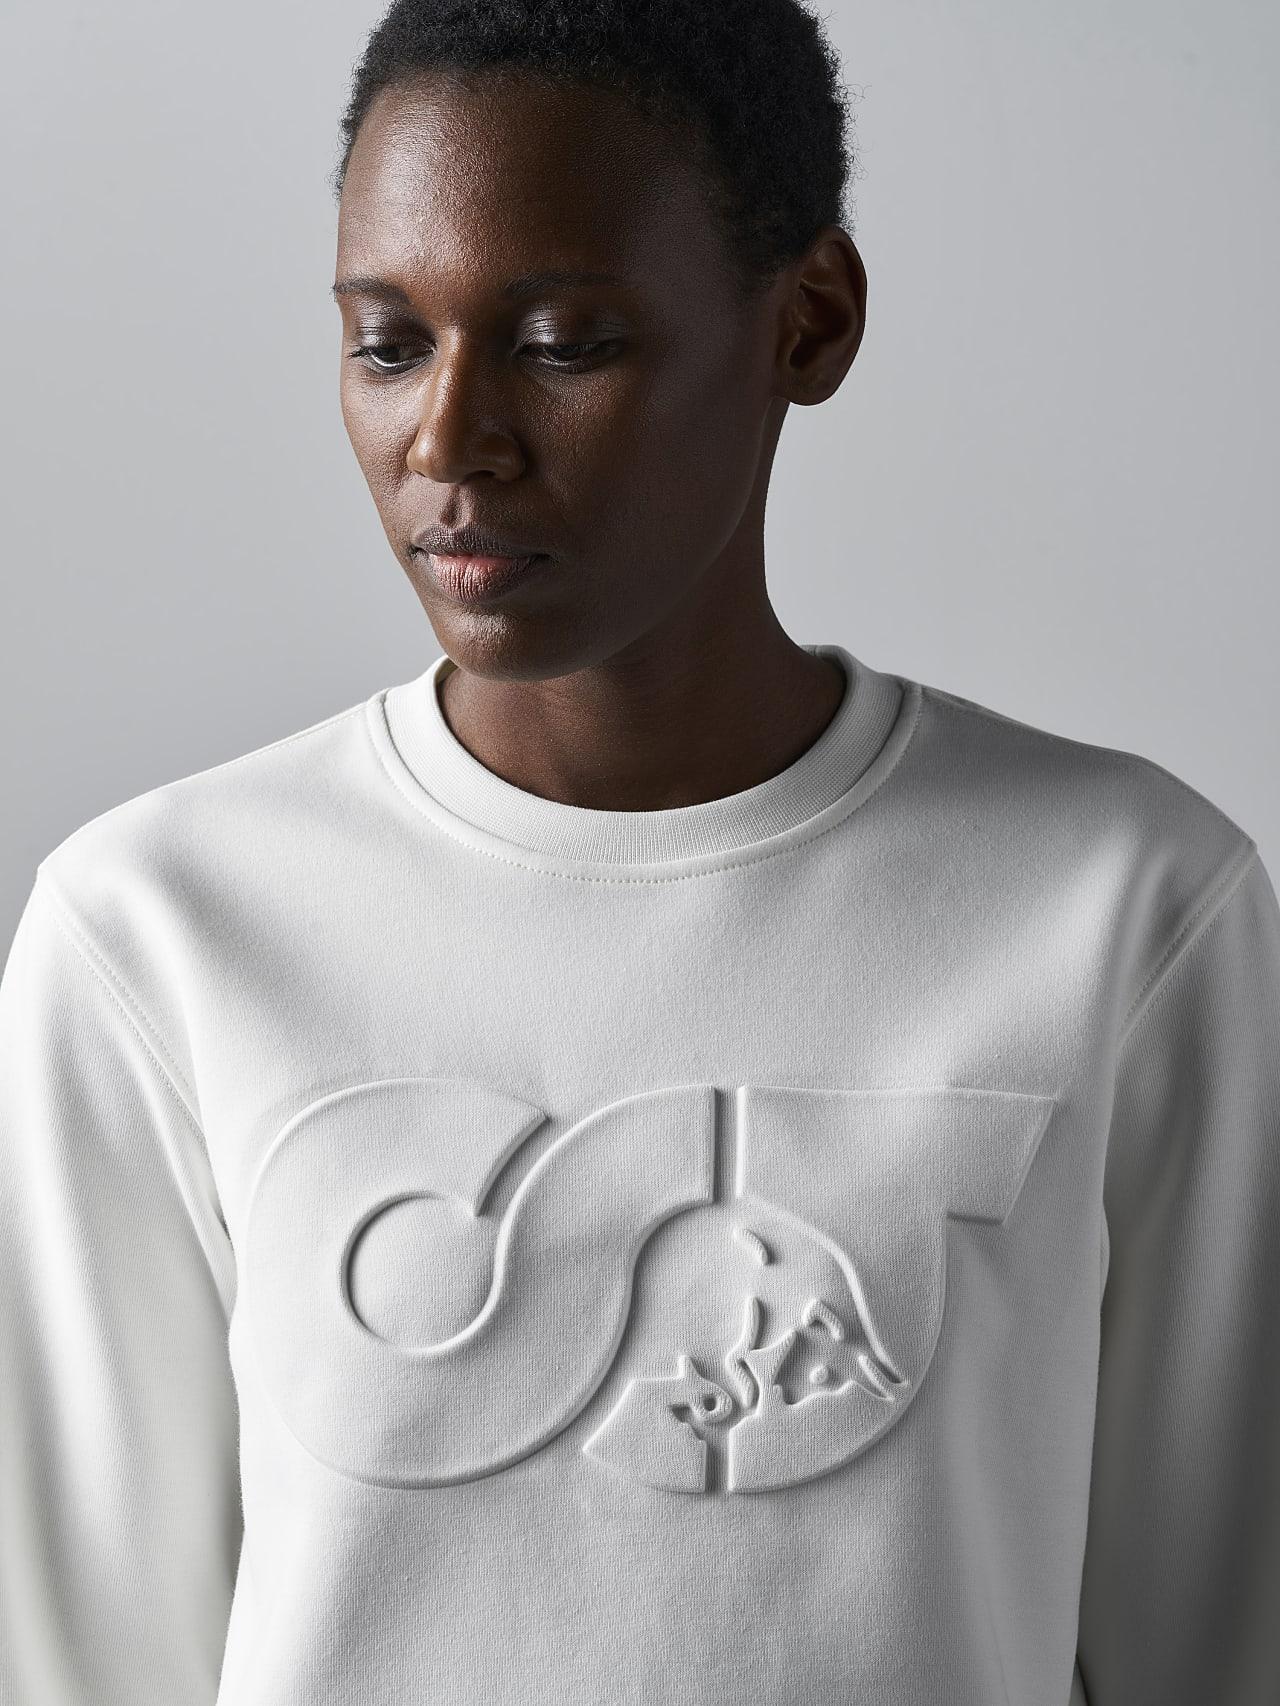 SHINT V1.Y5.02 Premium Logo Sweater offwhite Right Alpha Tauri